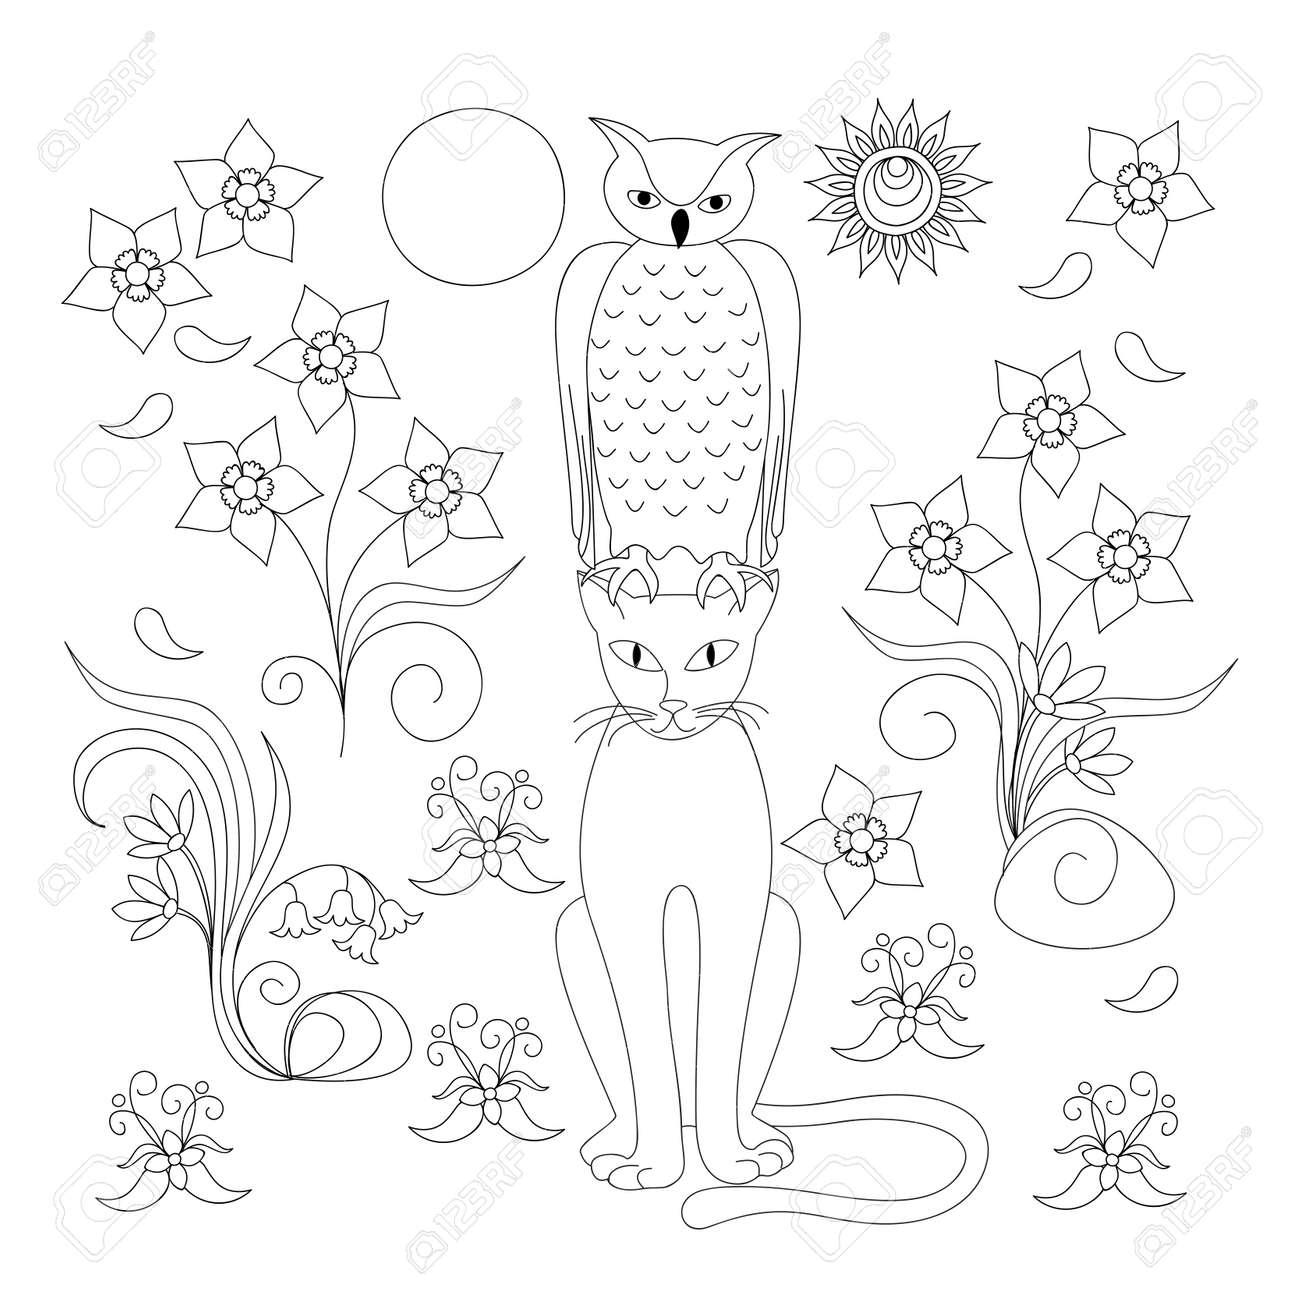 Dibujo Para Colorear Con Dibujado A Mano Gato De Dibujos Animados